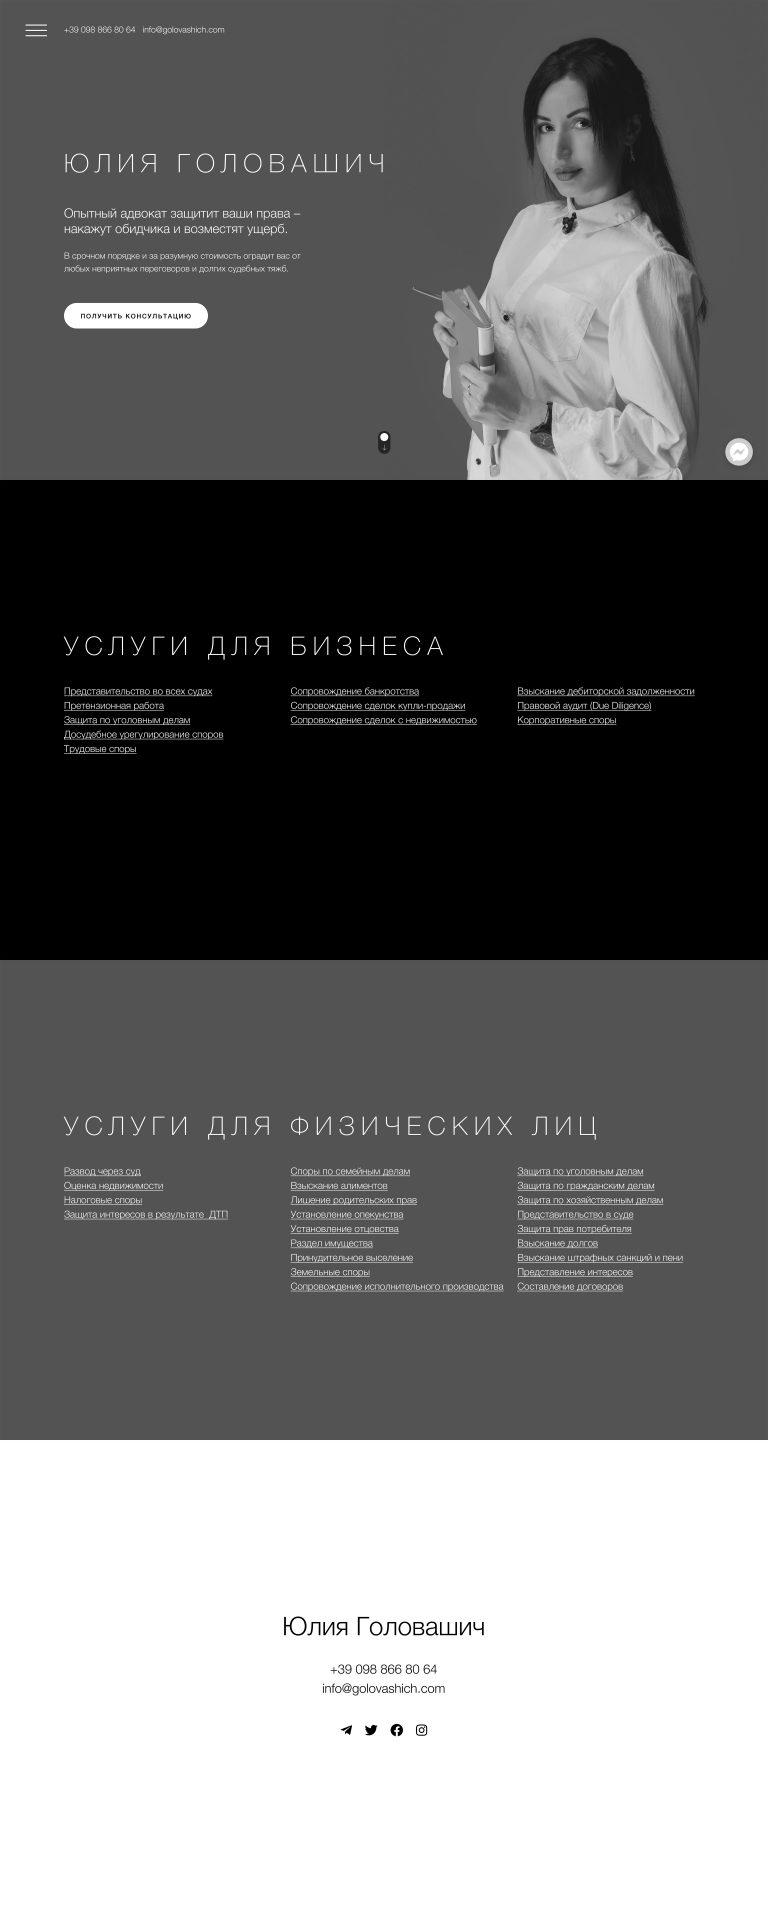 Yulia Golovashich